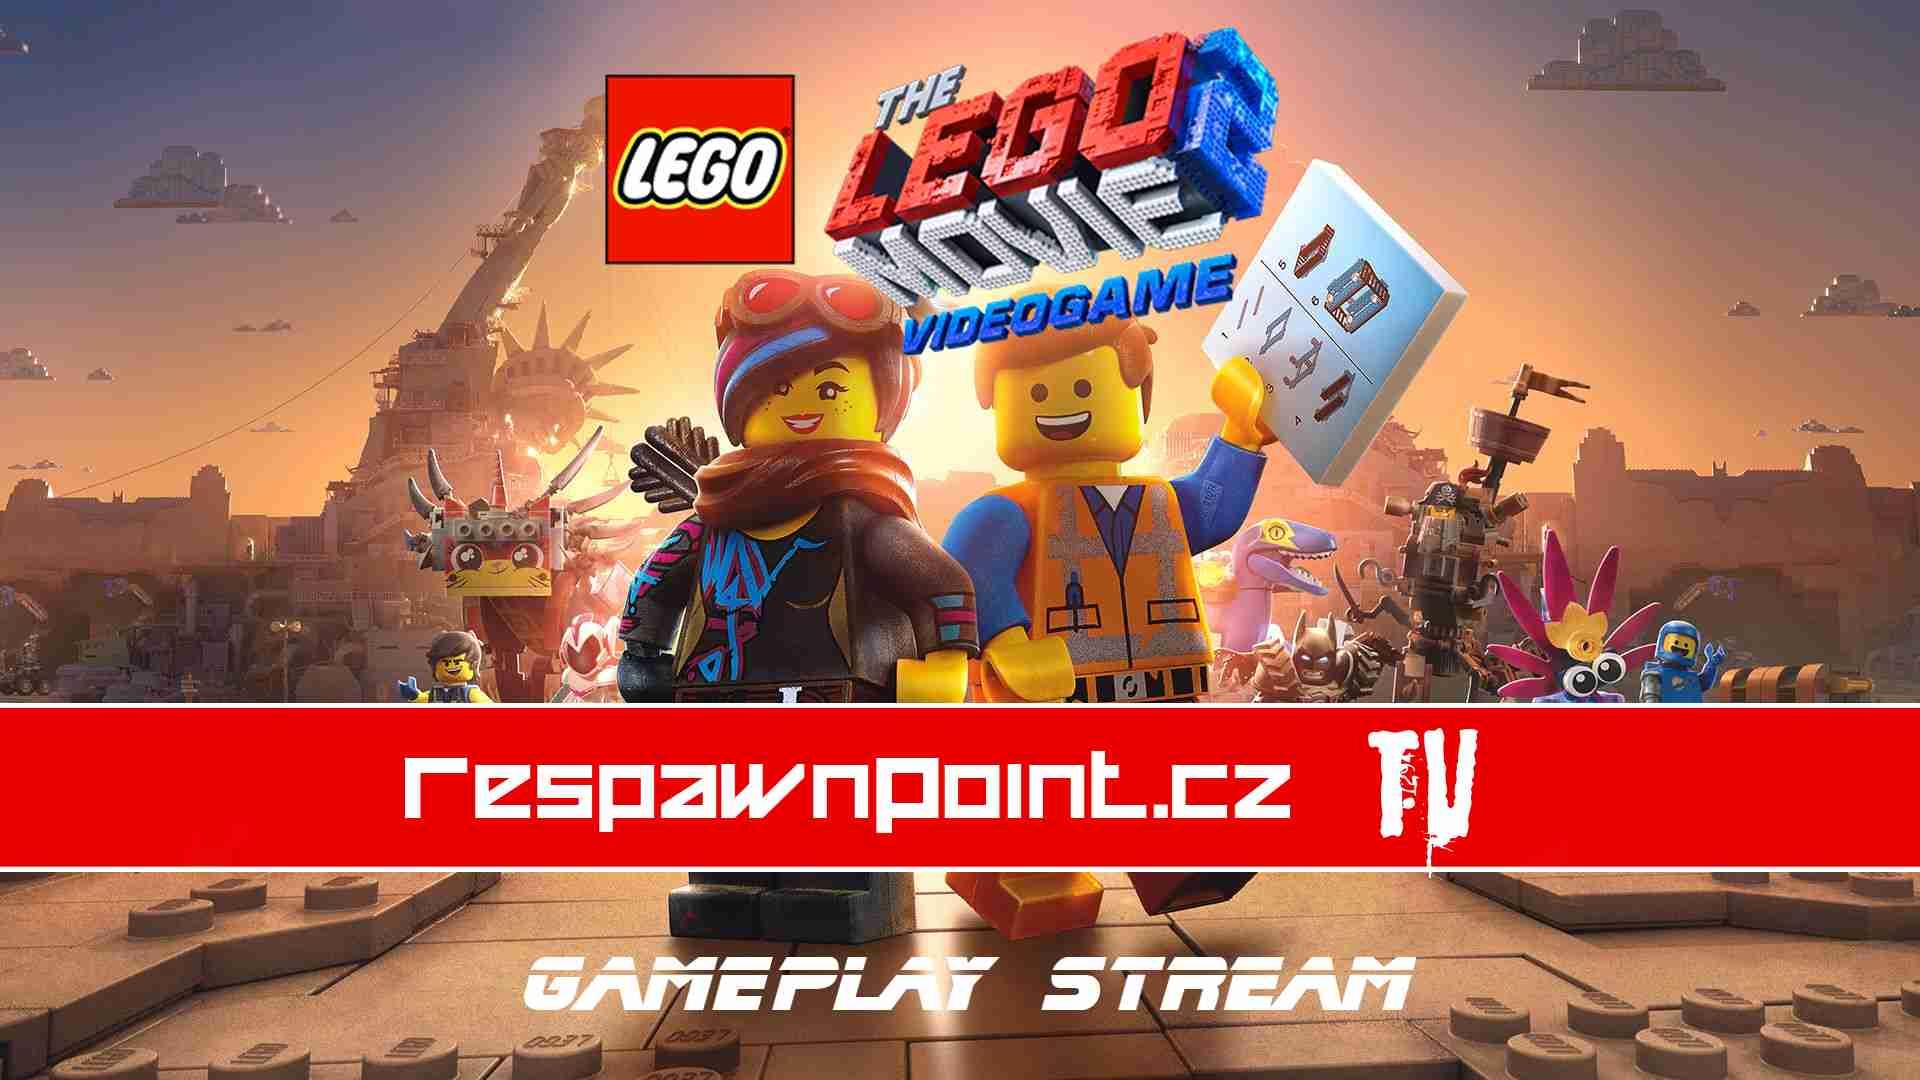 LEGO Movie Videogame 2 – Gameplay Stream